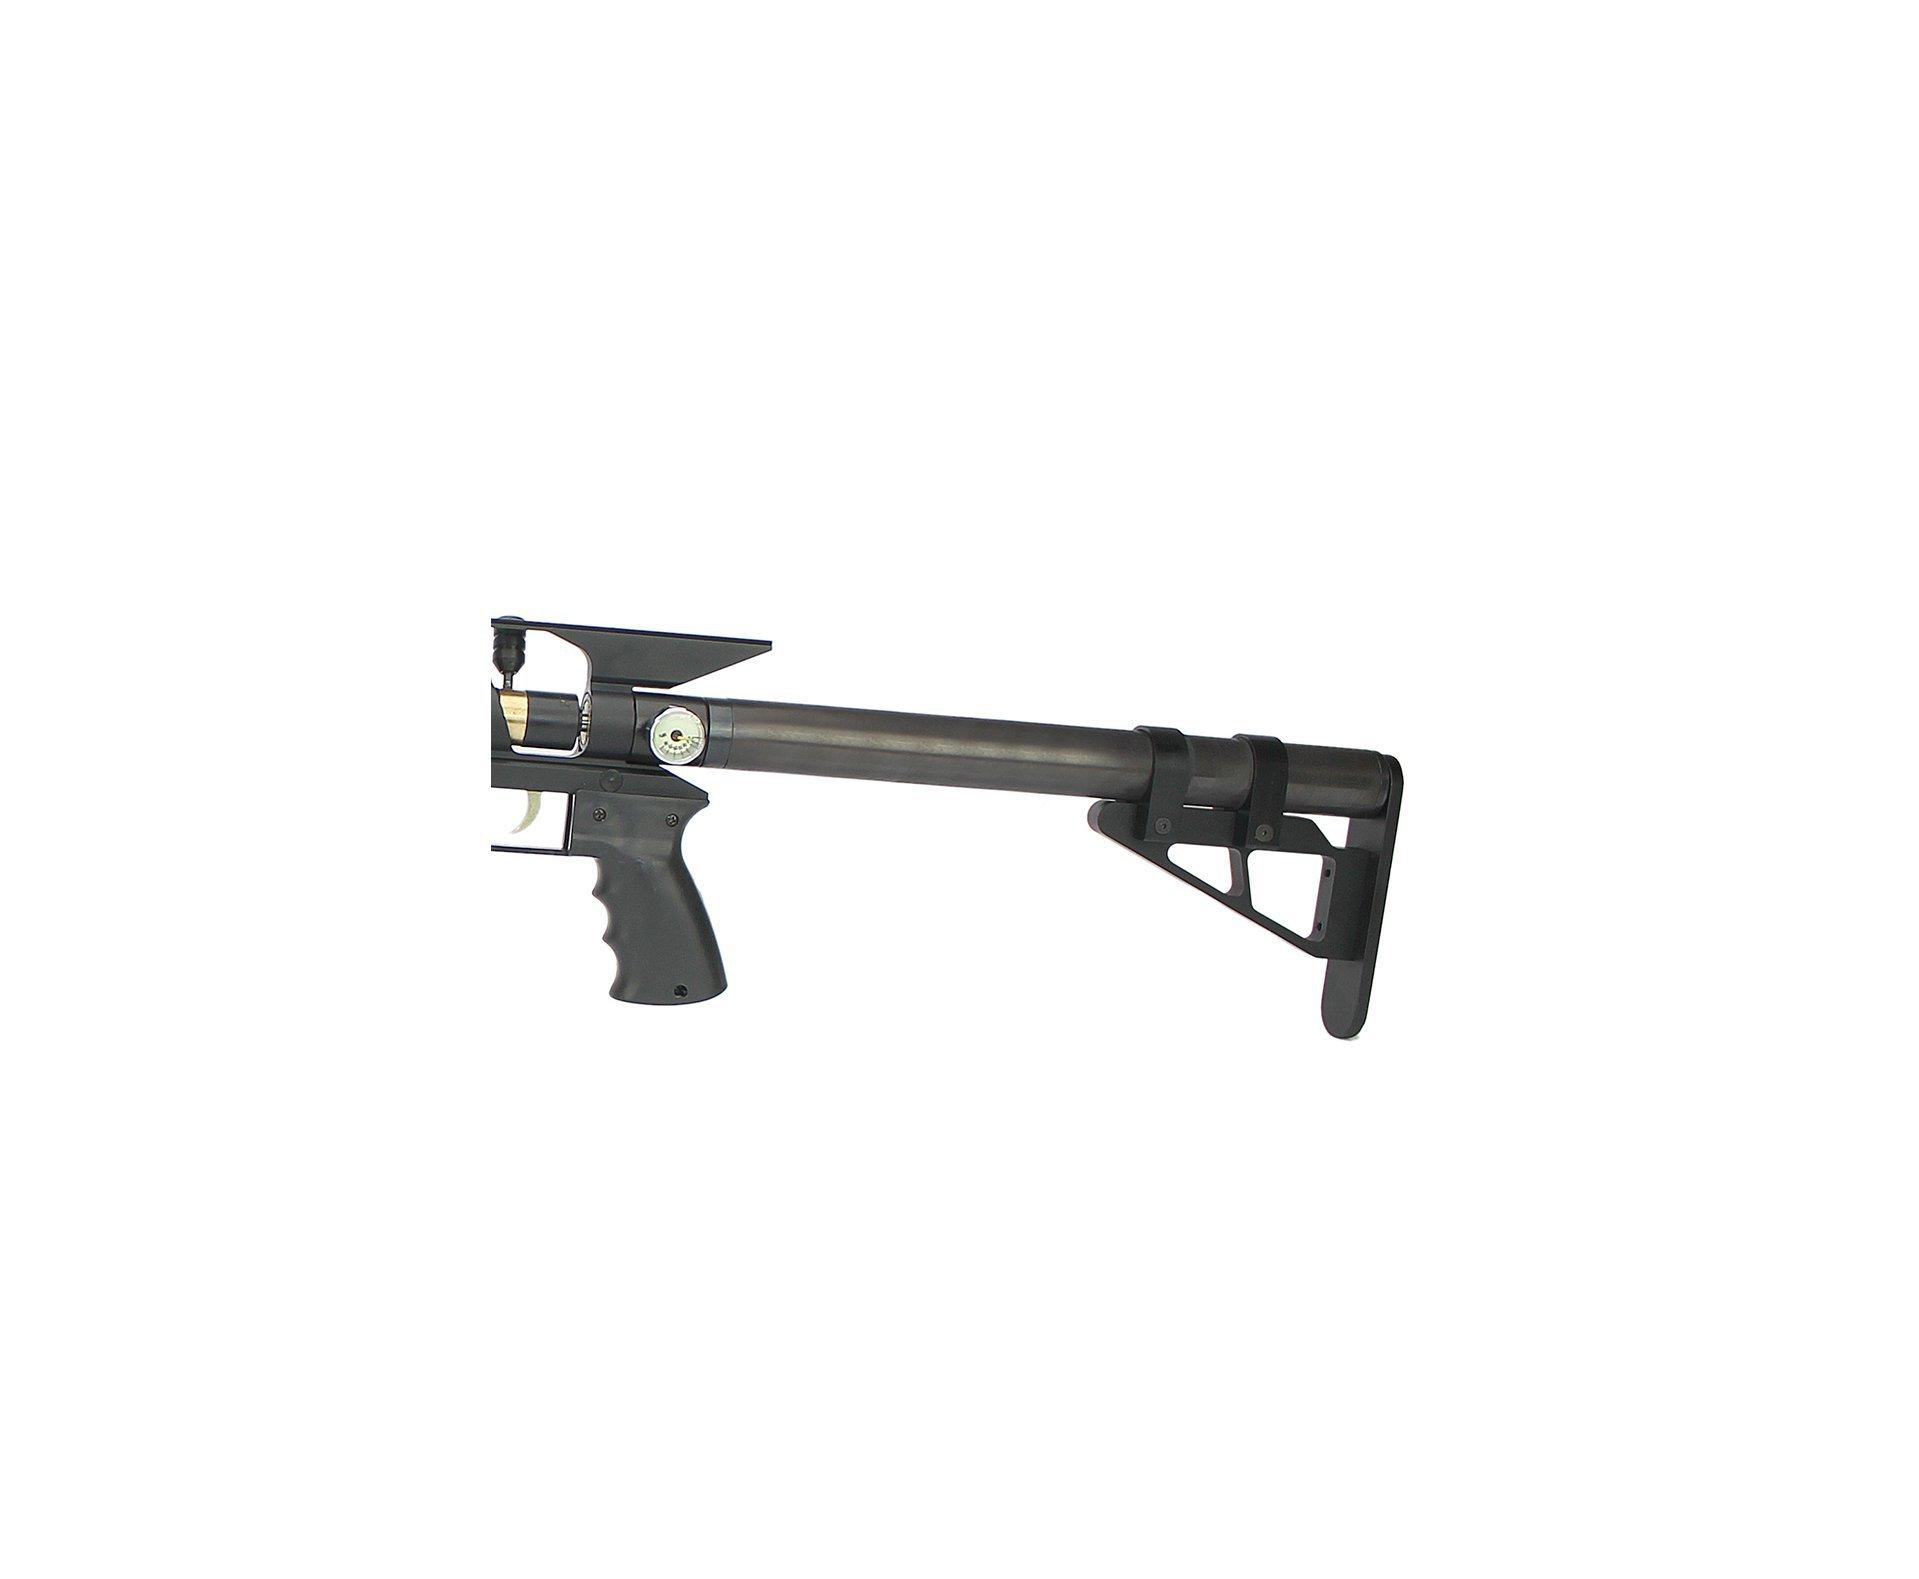 Carabina De Pressão Pcp Hunter Custon Ultra Power 5,5mm - Preta